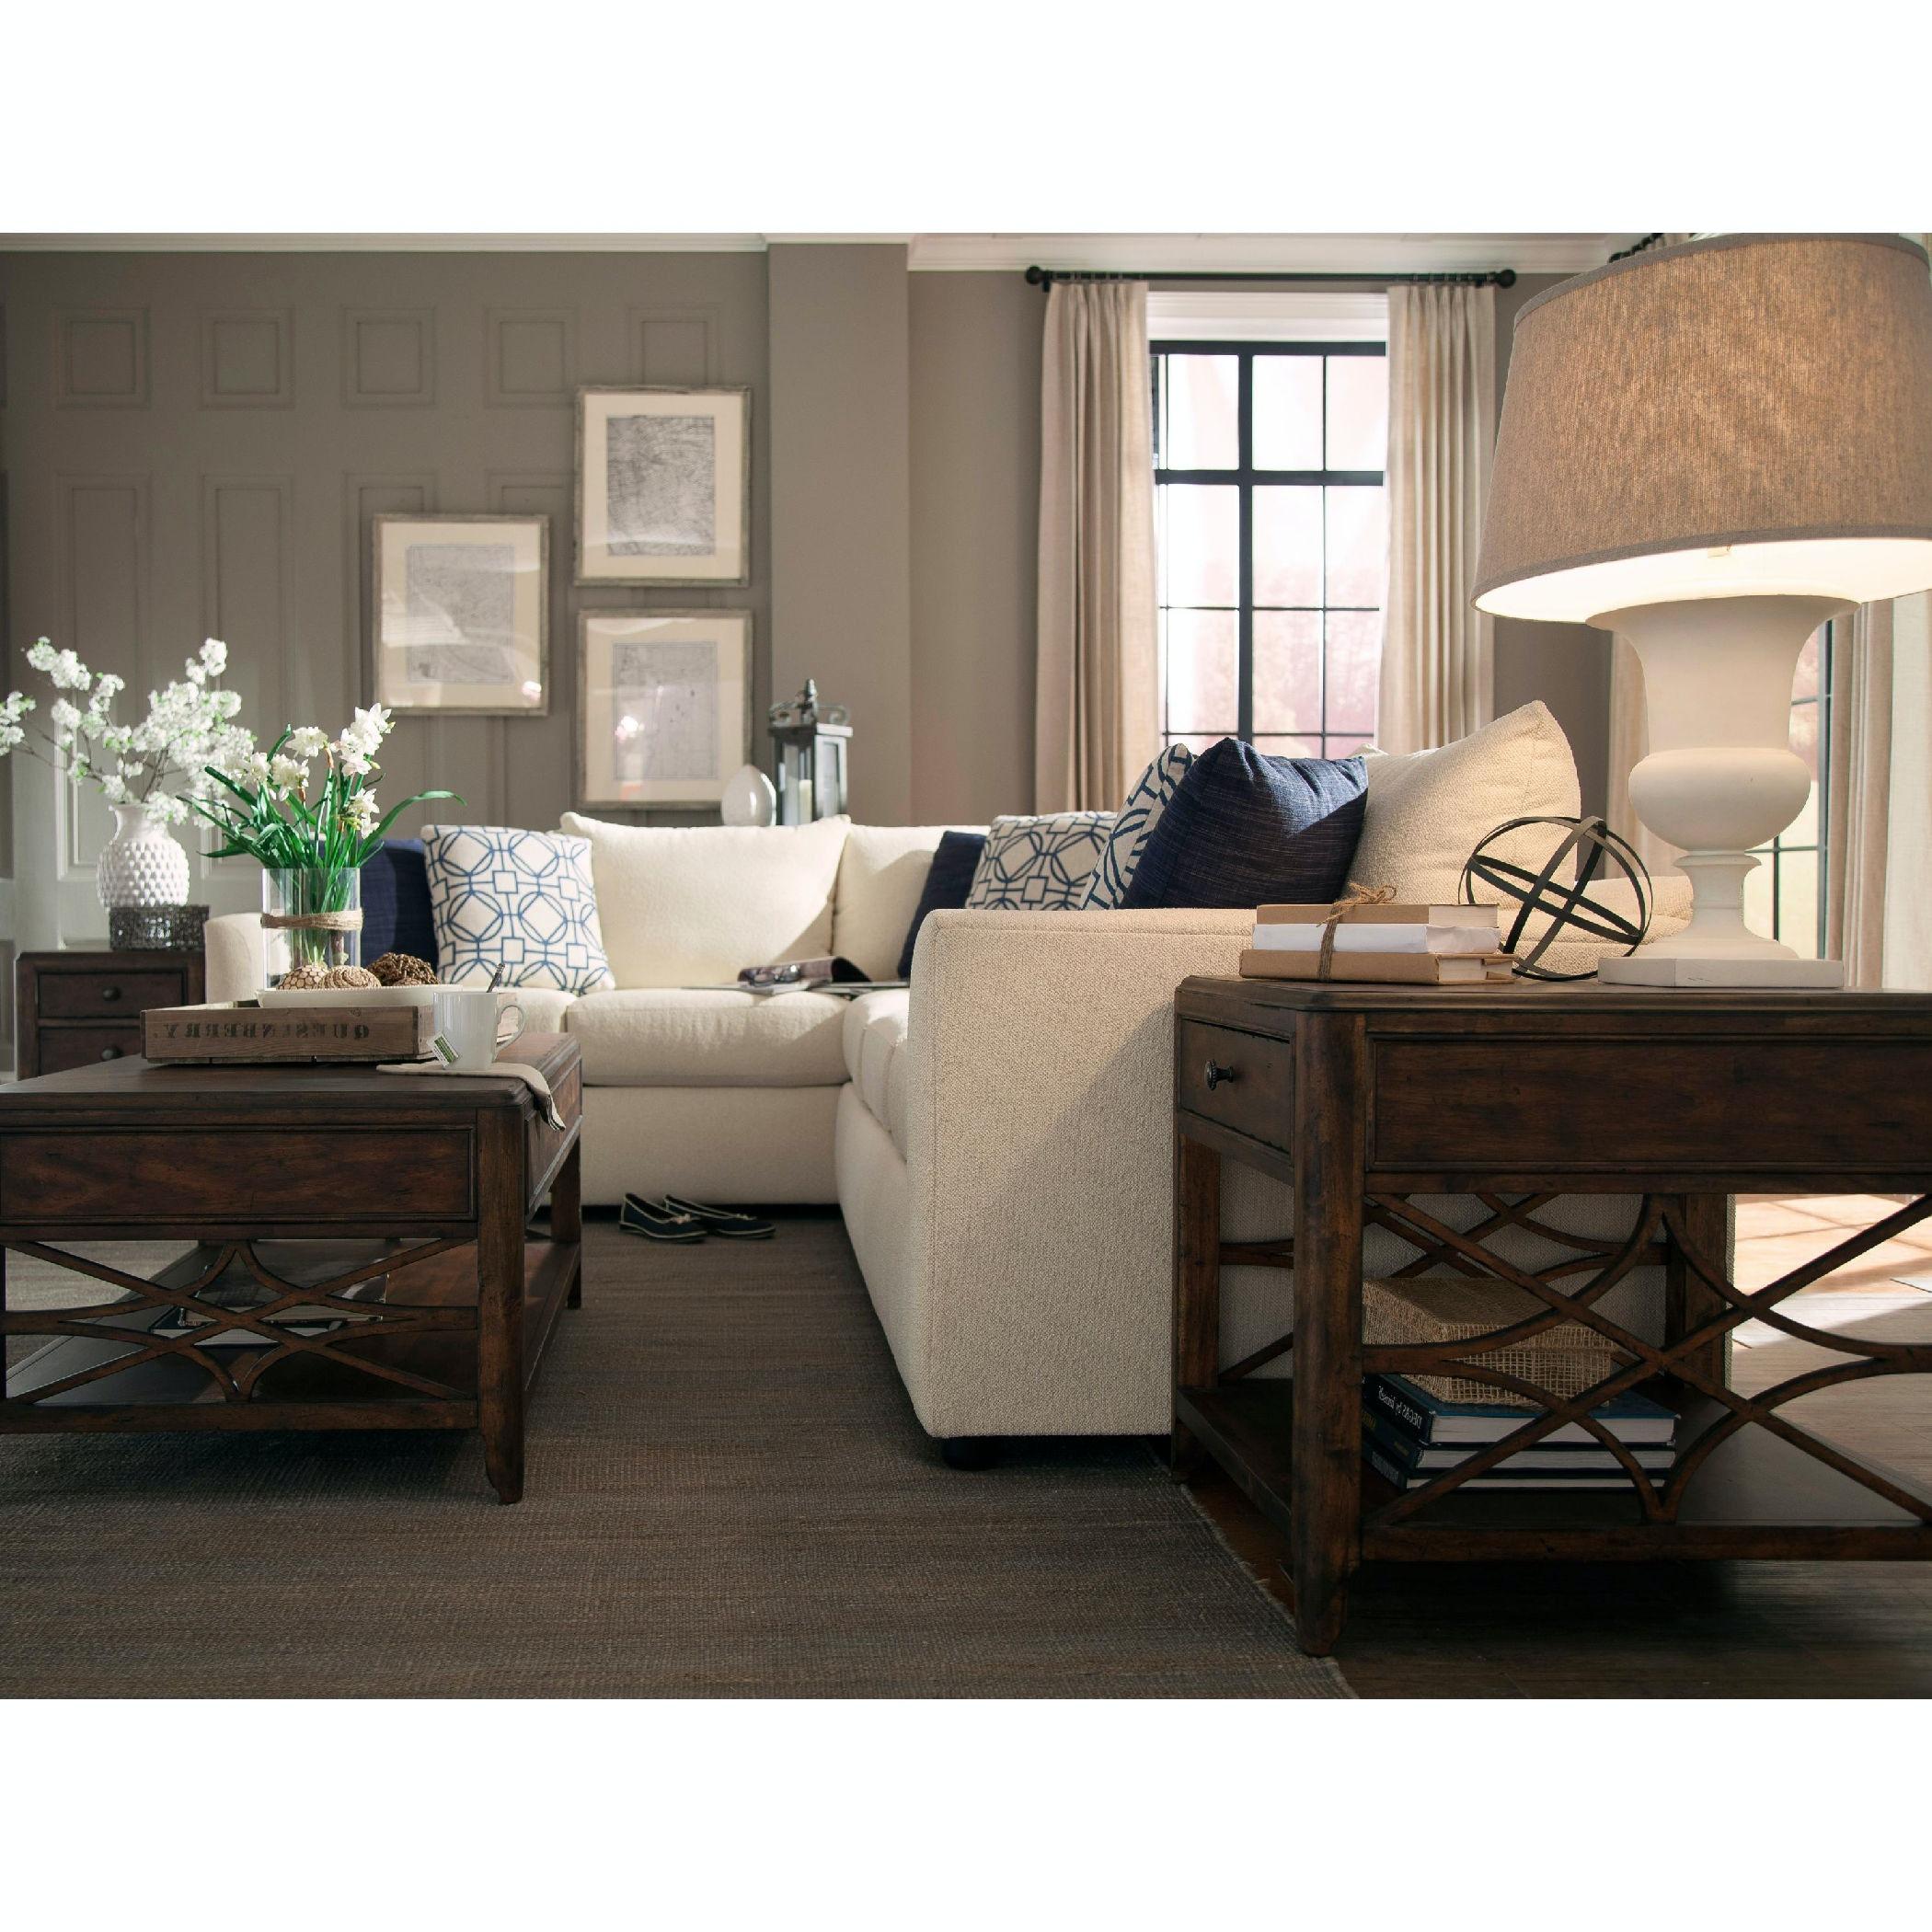 trisha yearwood atlanta 2piece sectional with rightarm facing sofa - 2 Piece Sectional